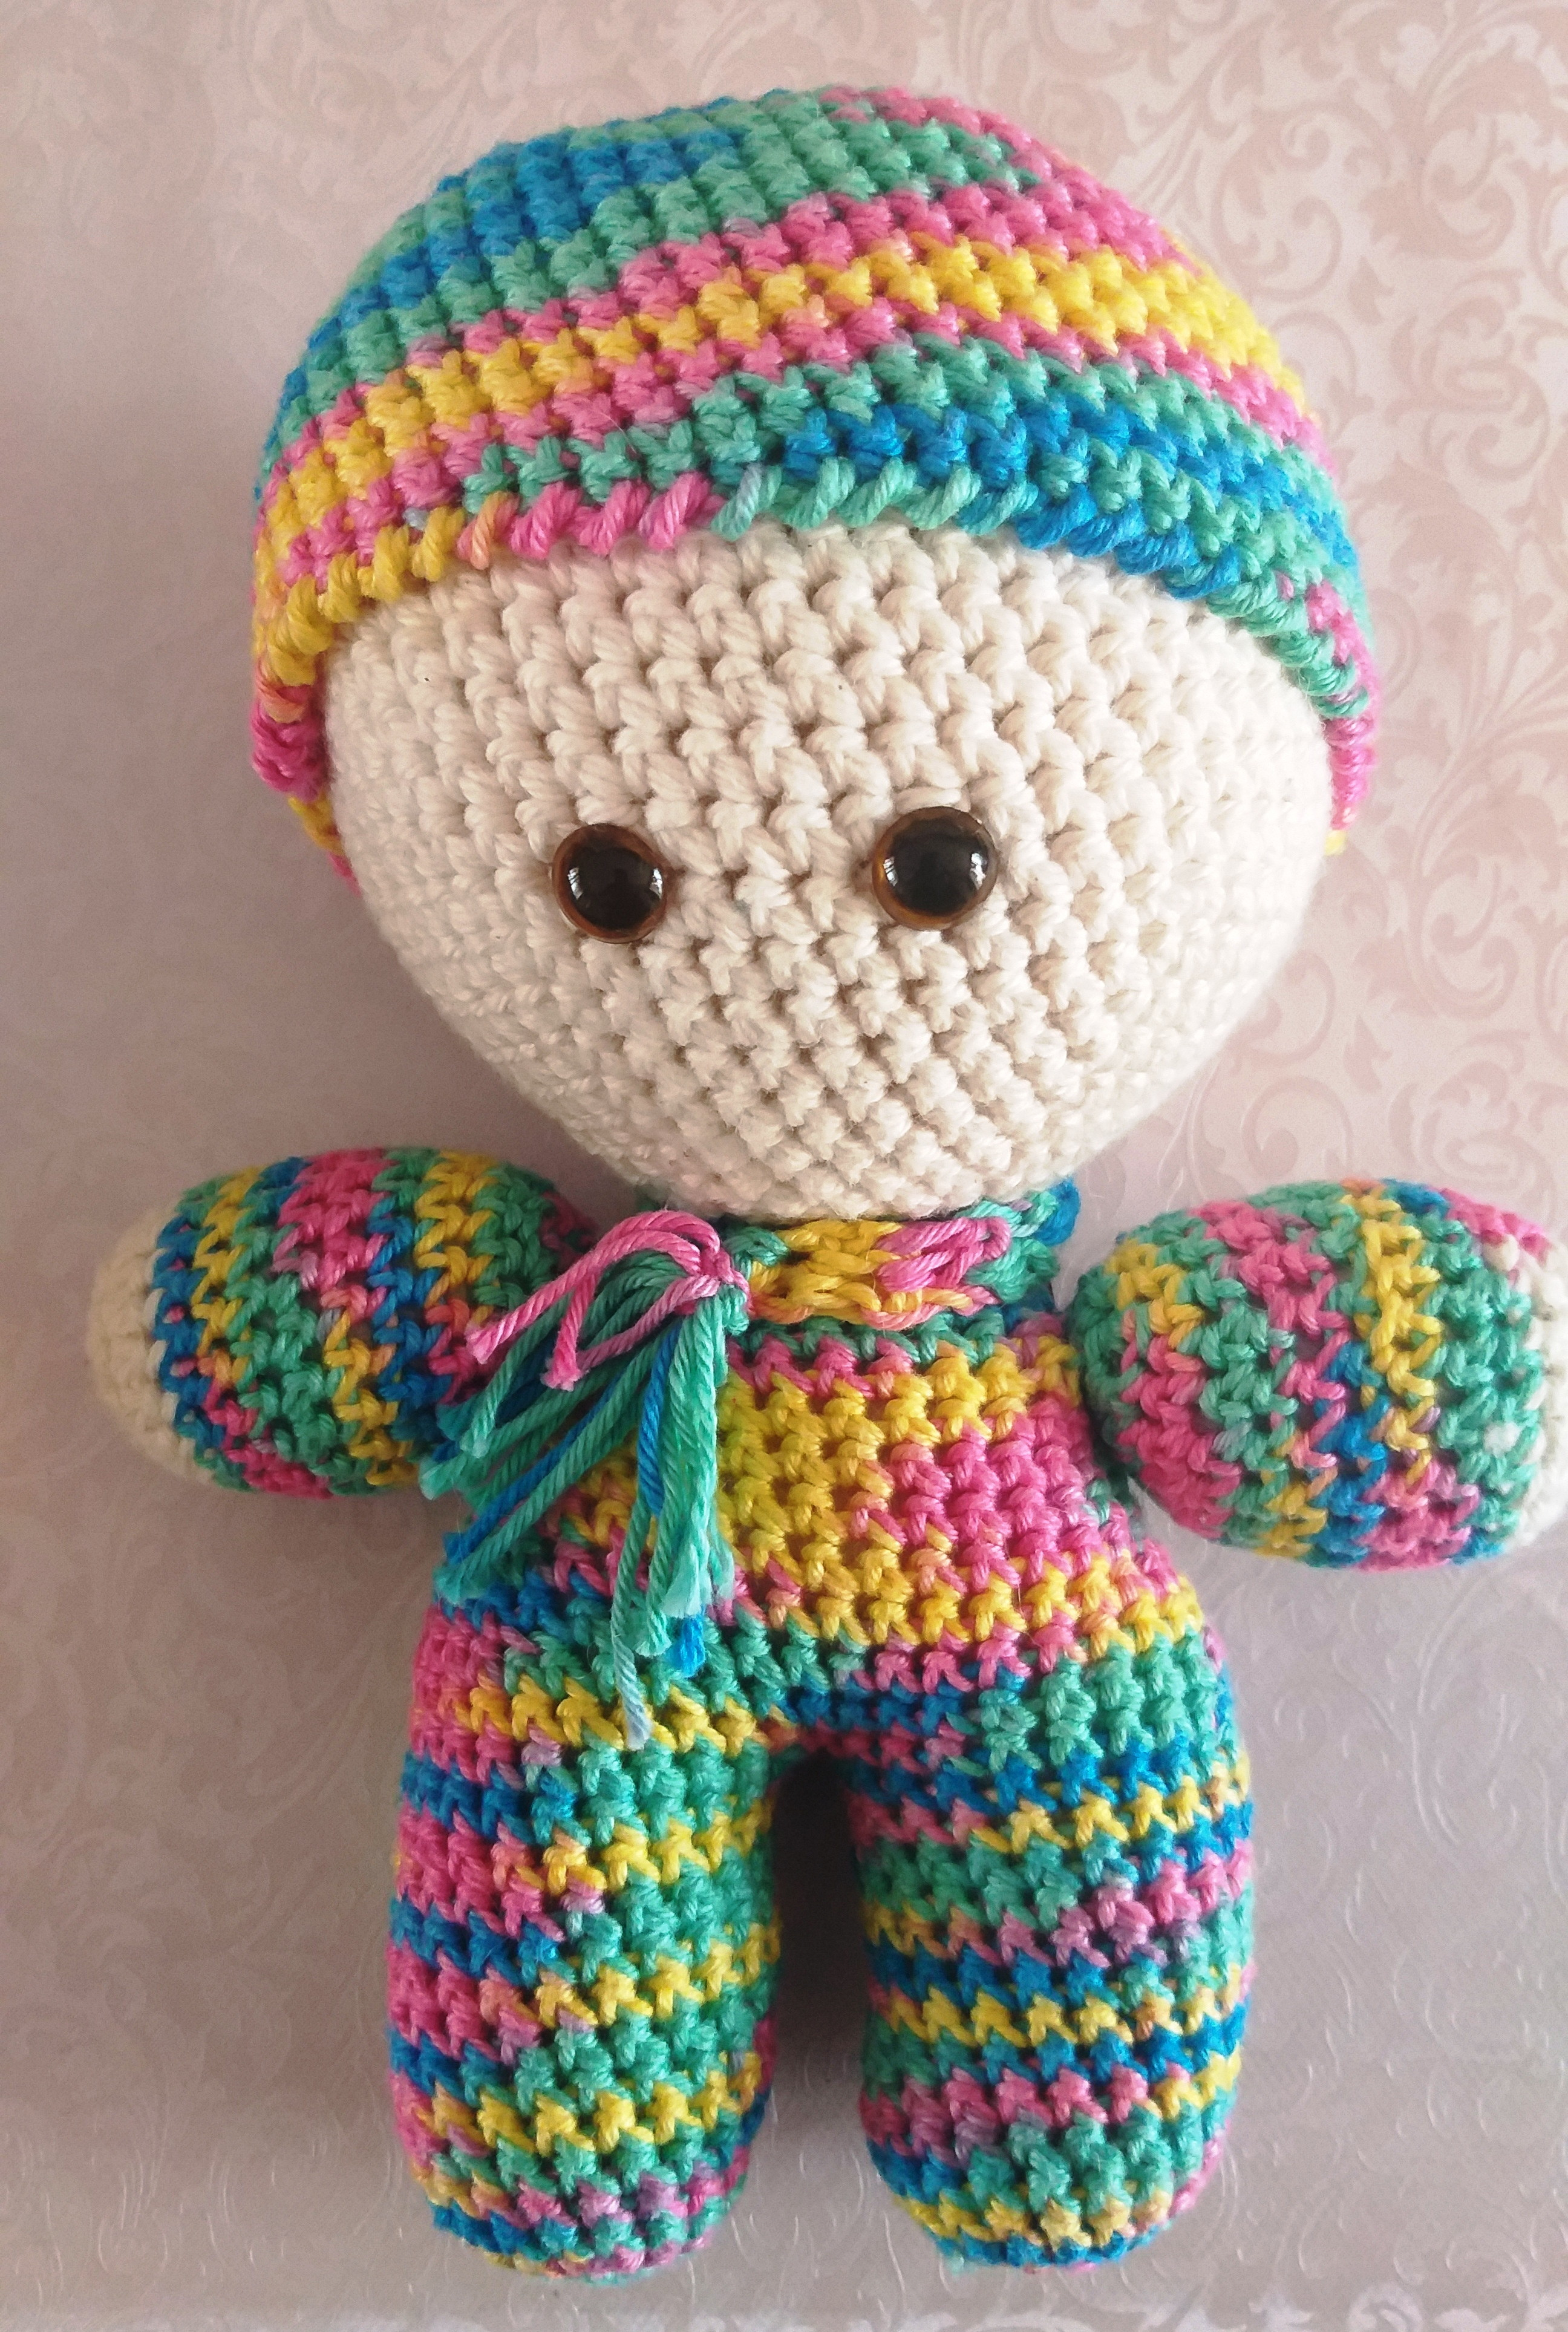 Boneco Yoyo Em Crochet Em Amigurumi Chapéu Urso - R$ 68,00 em ... | 3855x2592